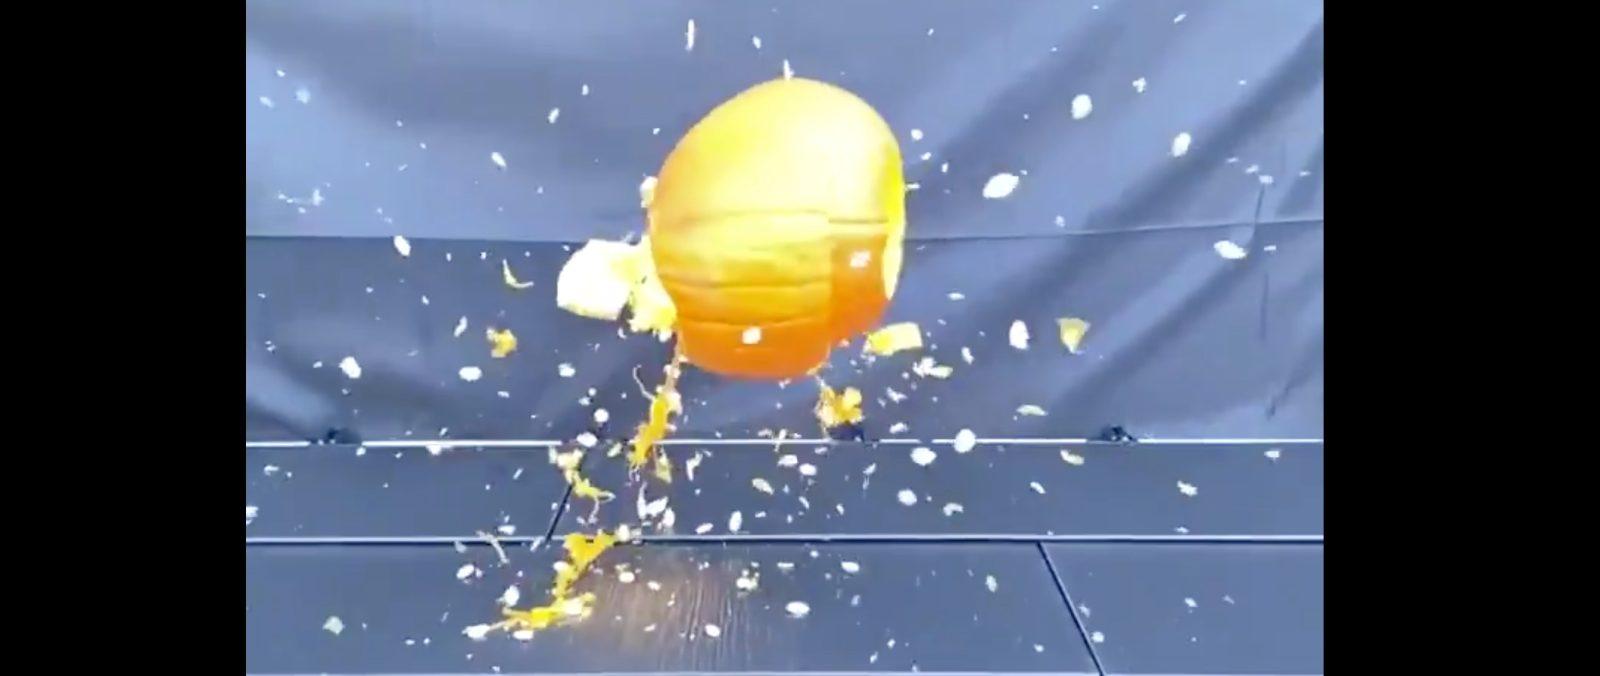 Tesla Solar Roof Glass Wins Against Pumpkin But Questions